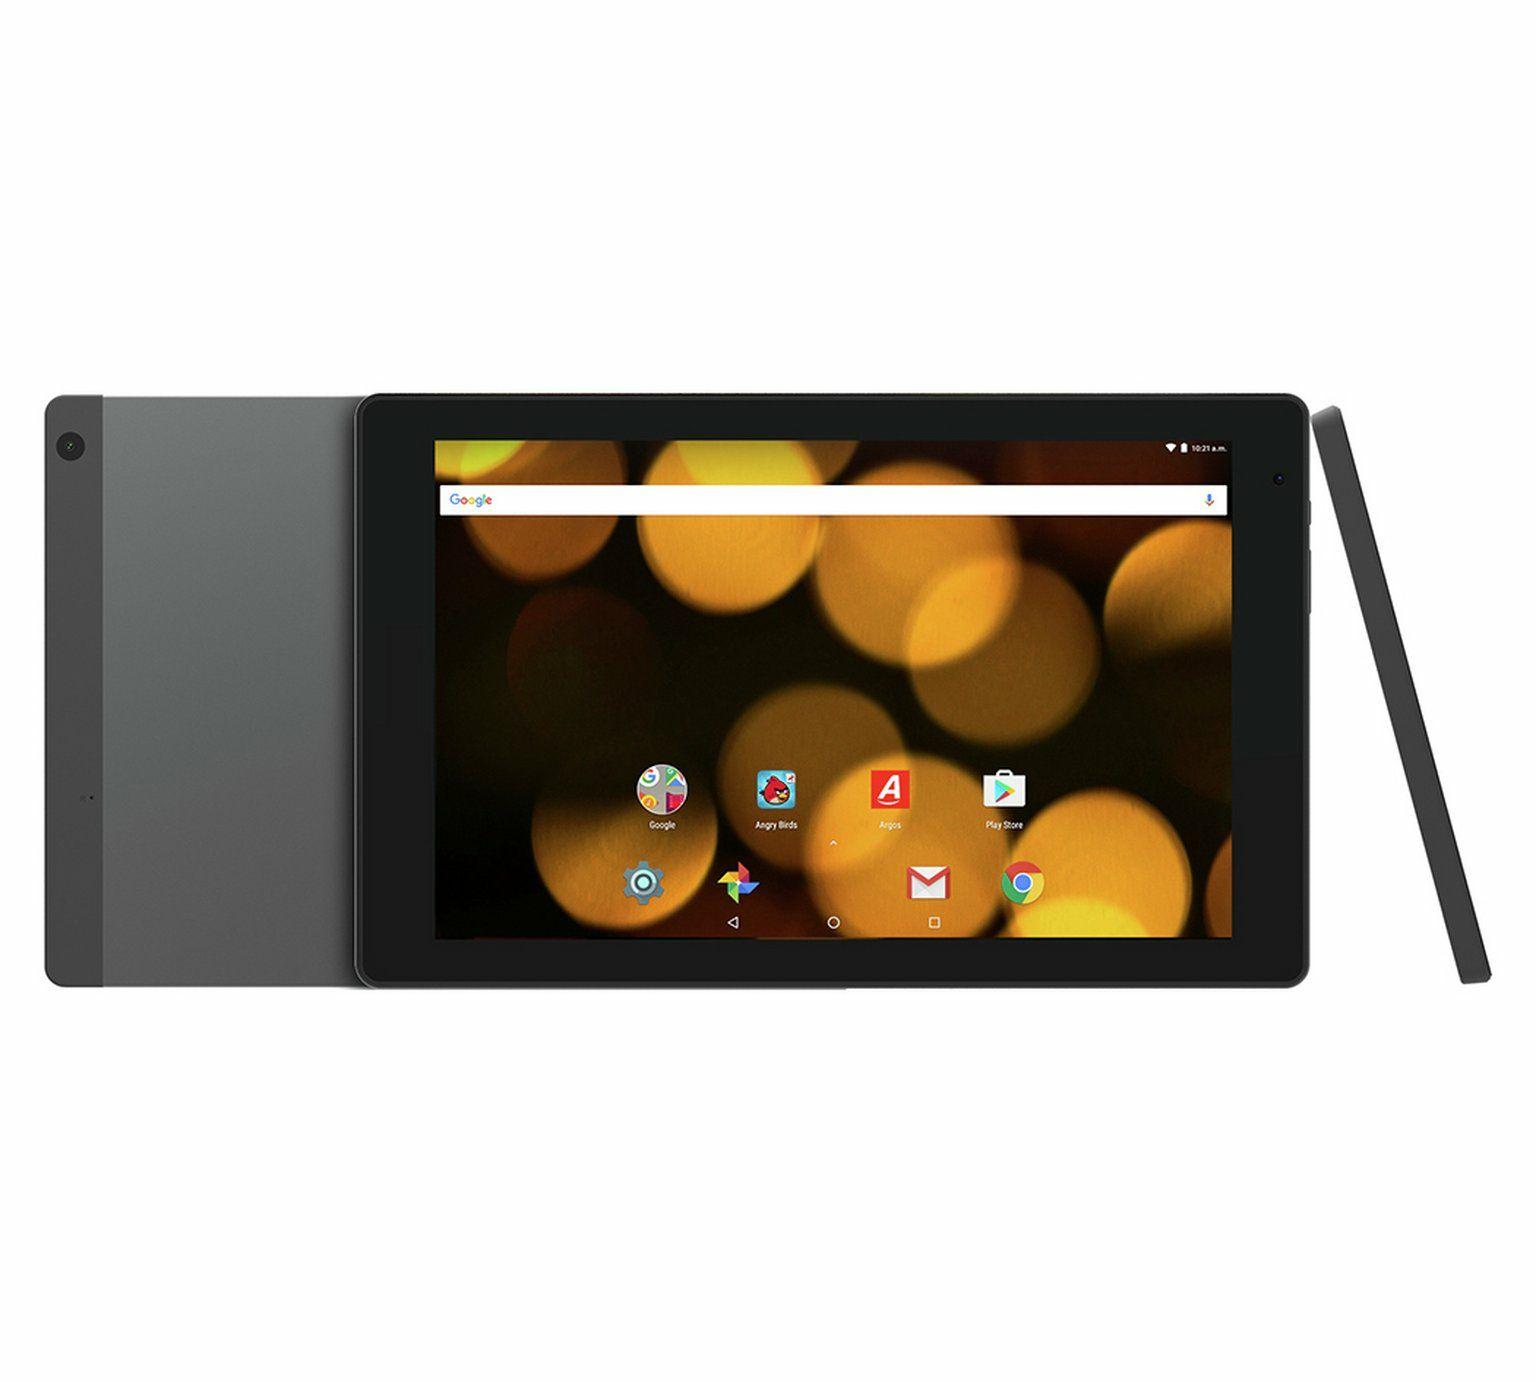 Bush Spira B3 10 Inch 32GB Tablet - £10 Off £109.99 @ Argos